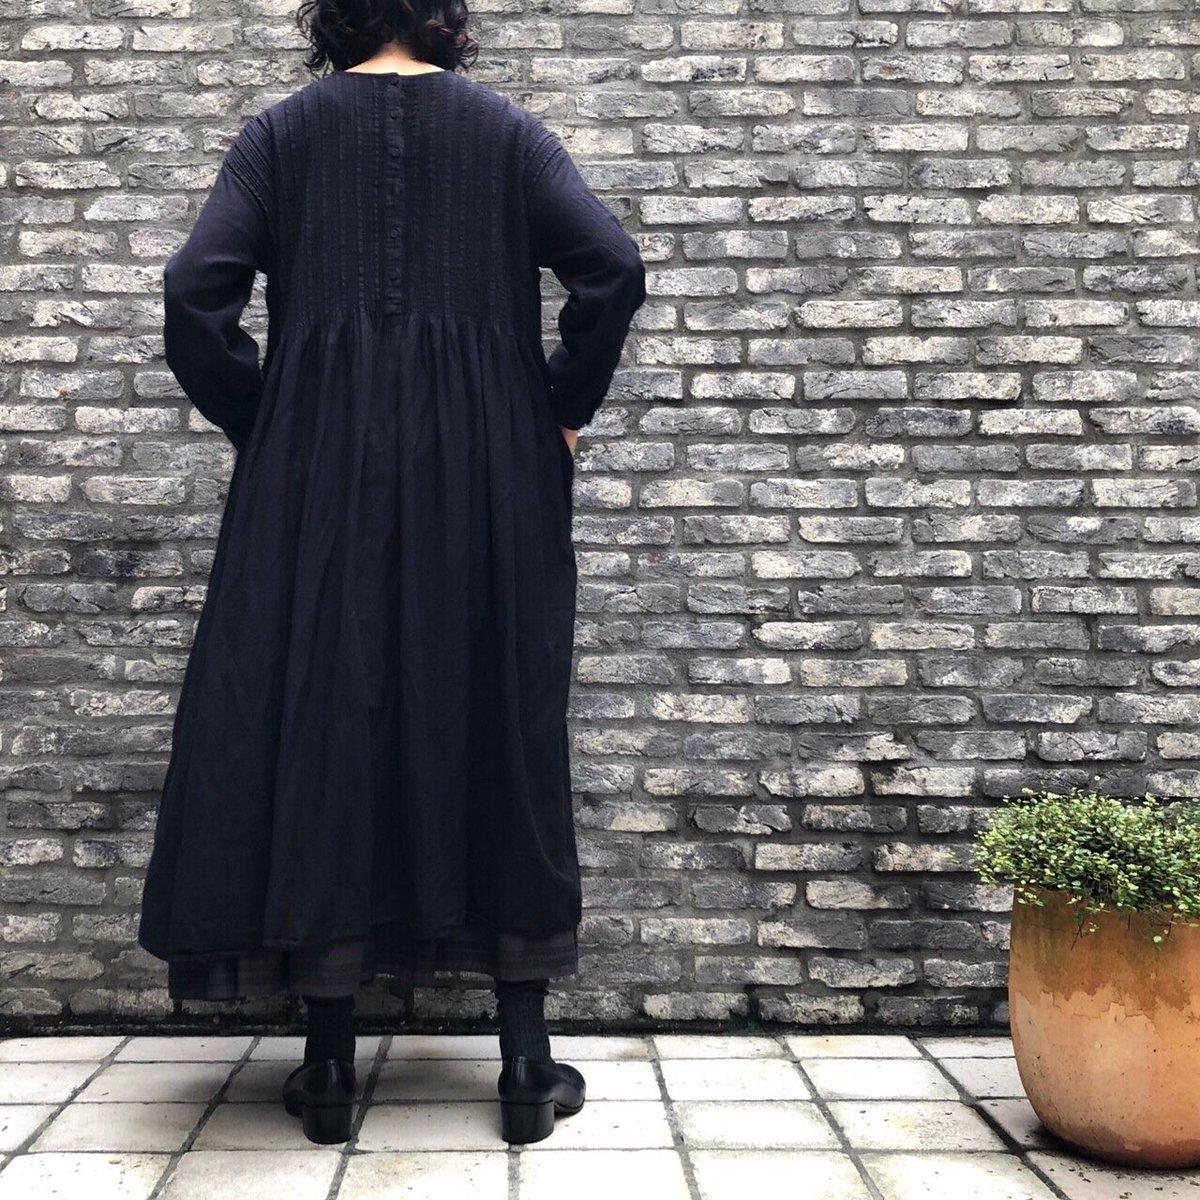 2020.10.20(Tue) ~TWILL COTTON KHADI~  人気のTWILL COTTON KHADIにブラックが追加入荷いたします‼︎ 今回はニュアンスの違うブラック2色をご用意しております。  10月末頃に恵比寿・丸の内の各店舗で販売となります☺︎  #maisondesoil #tokyo #ebisu #marunouchi #india #cotton #khadi #black https://t.co/21f6TClC3Q